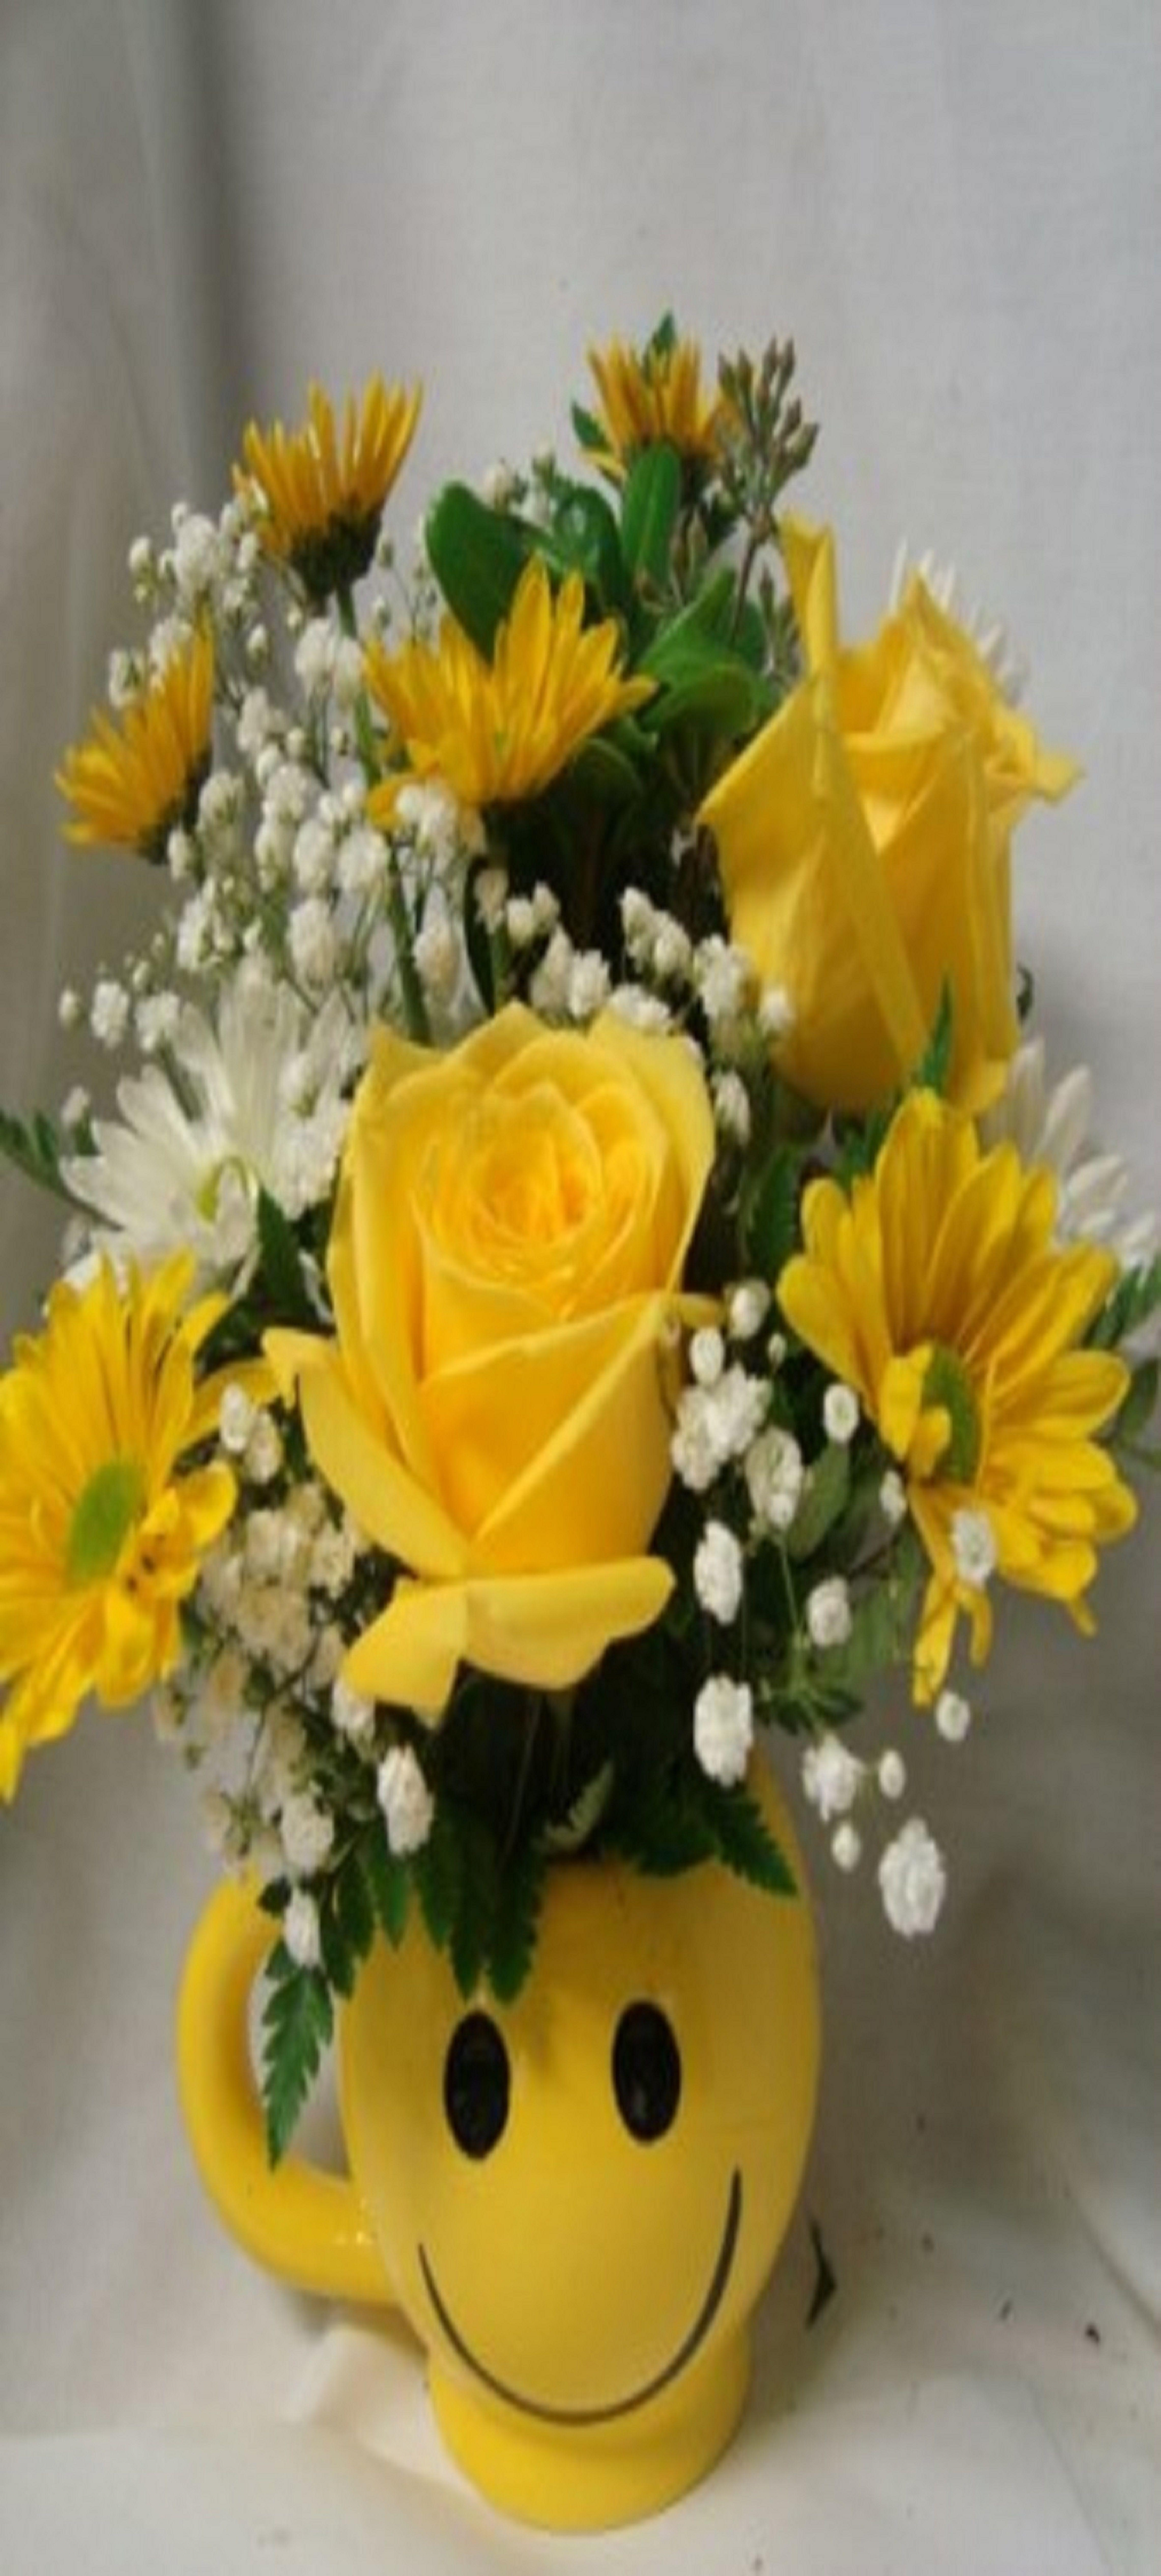 Pin by ivanka kostova on pinterest flower shops table decorations oxford lemon yellow daisies sorority gifts babys breath oxford shoe floral shops izmirmasajfo